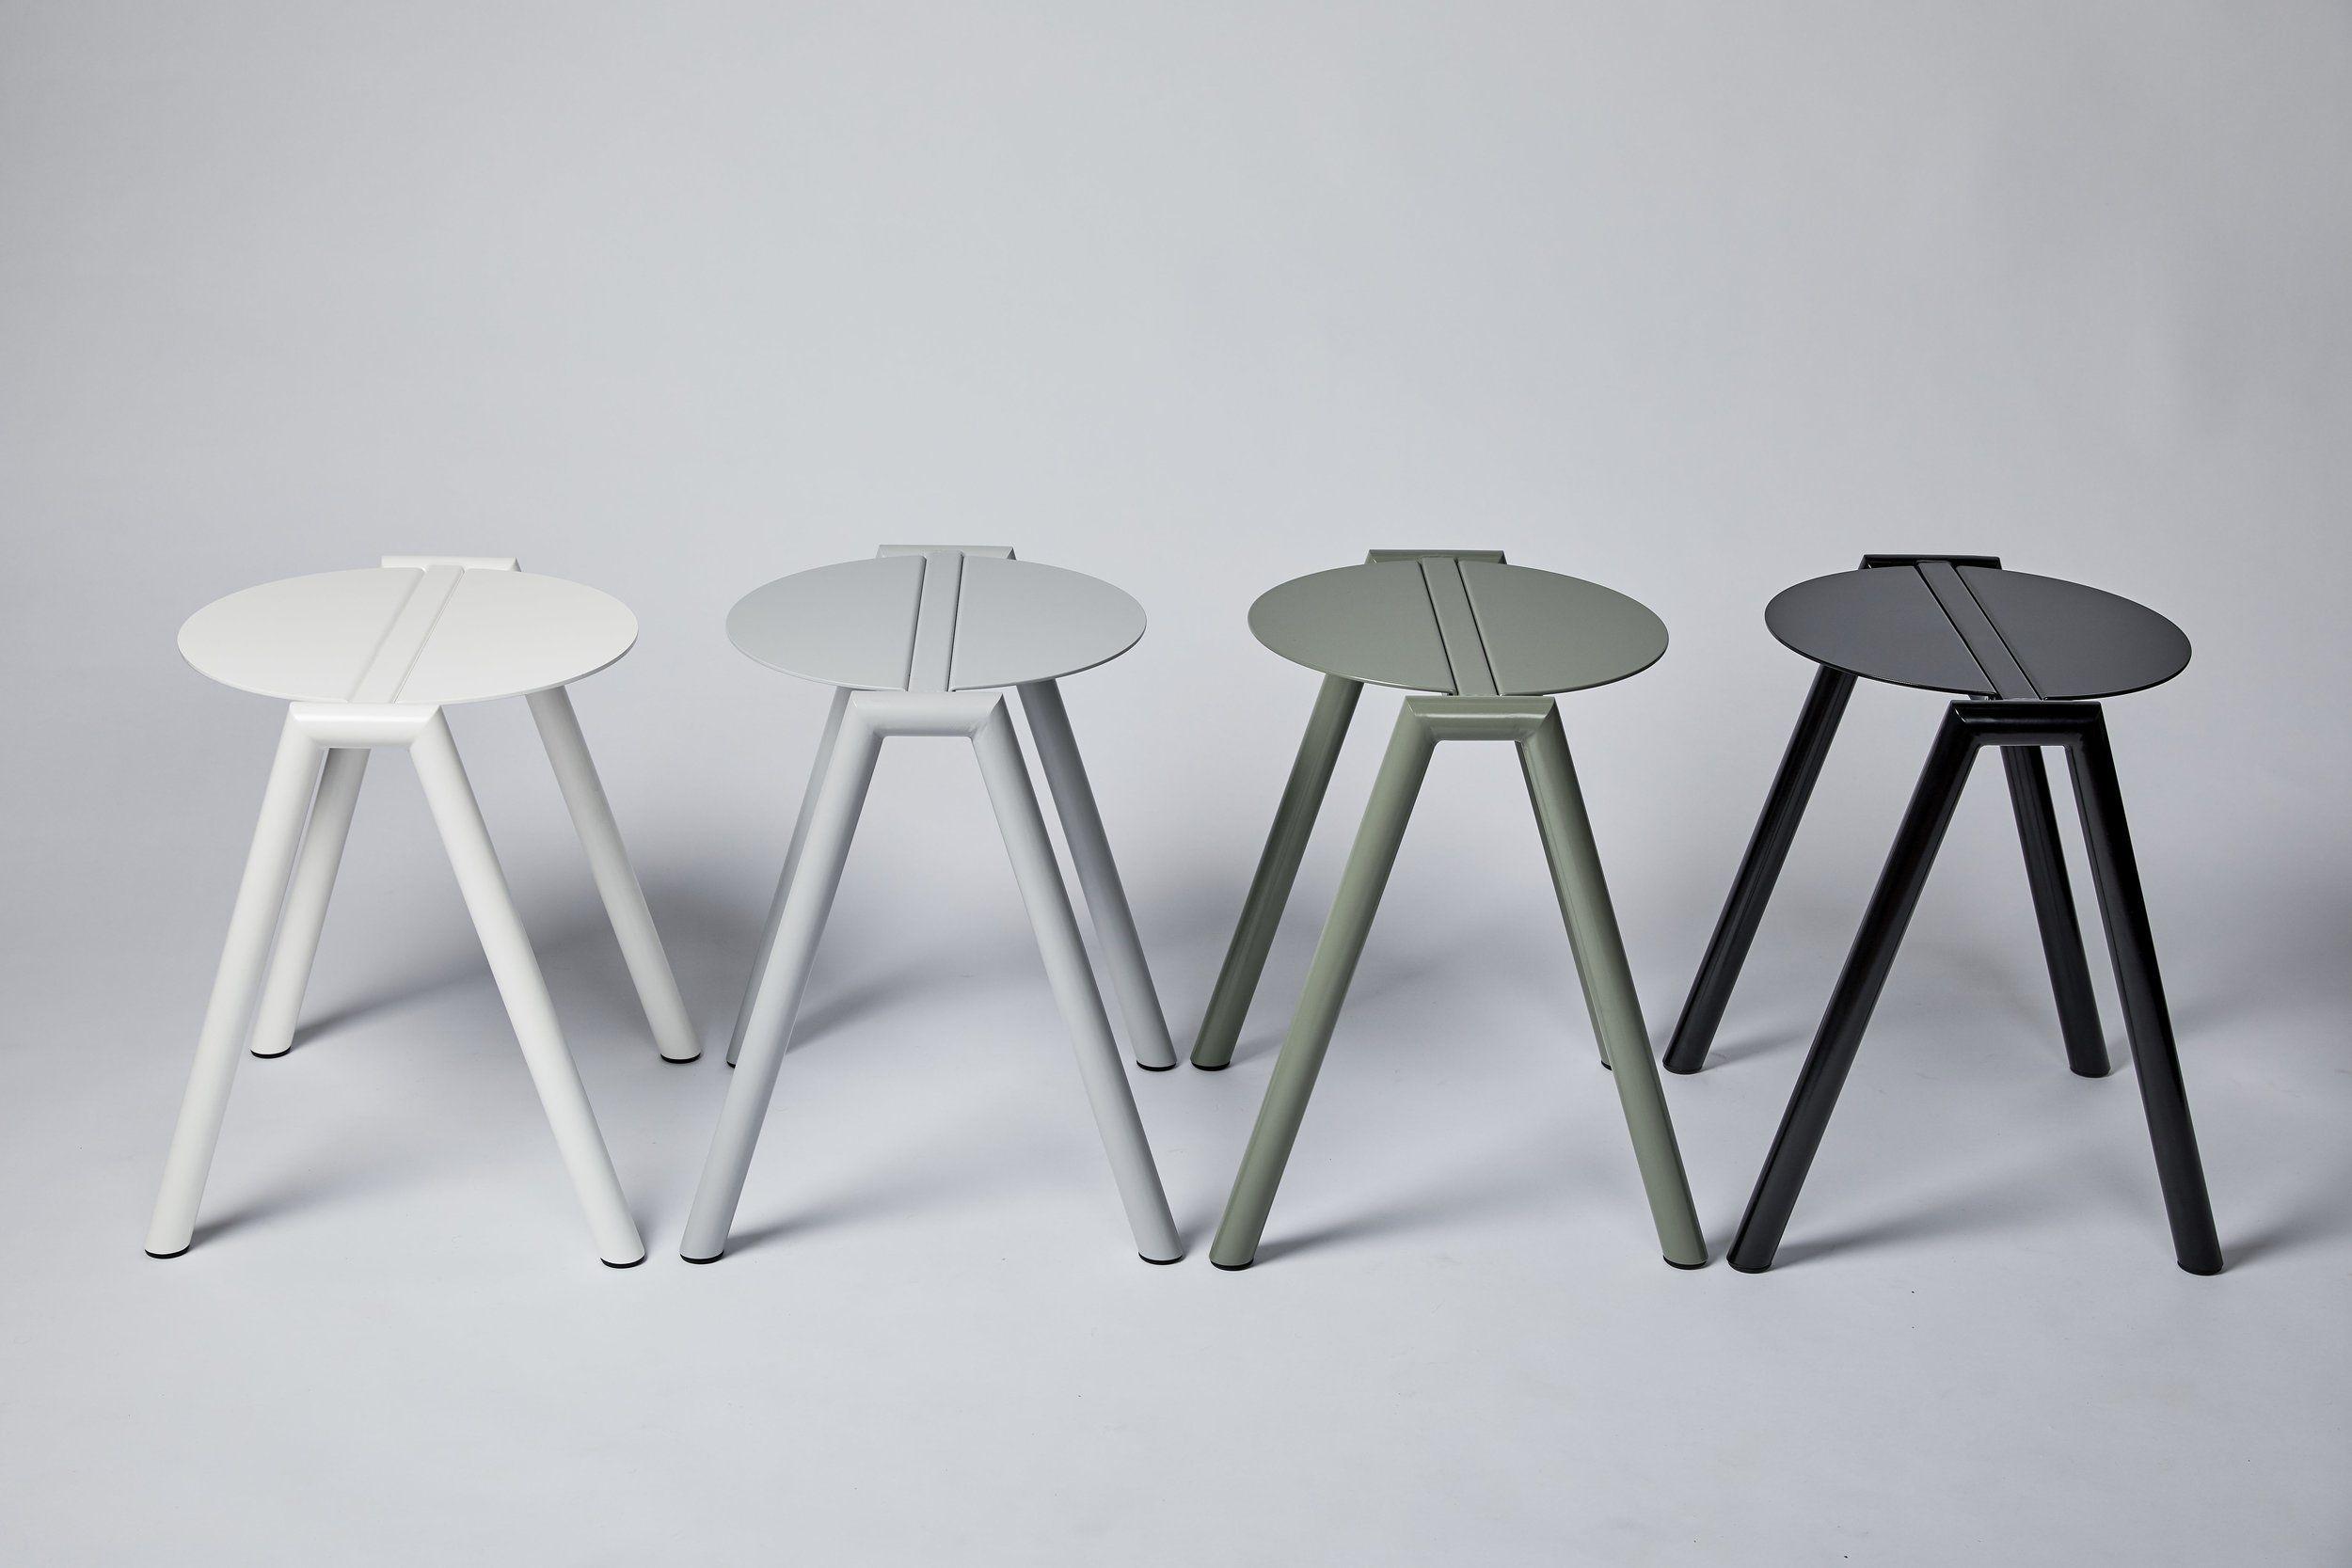 Astonishing Pin By Pinru Liu On Furniture Stool Stackable Stools Machost Co Dining Chair Design Ideas Machostcouk